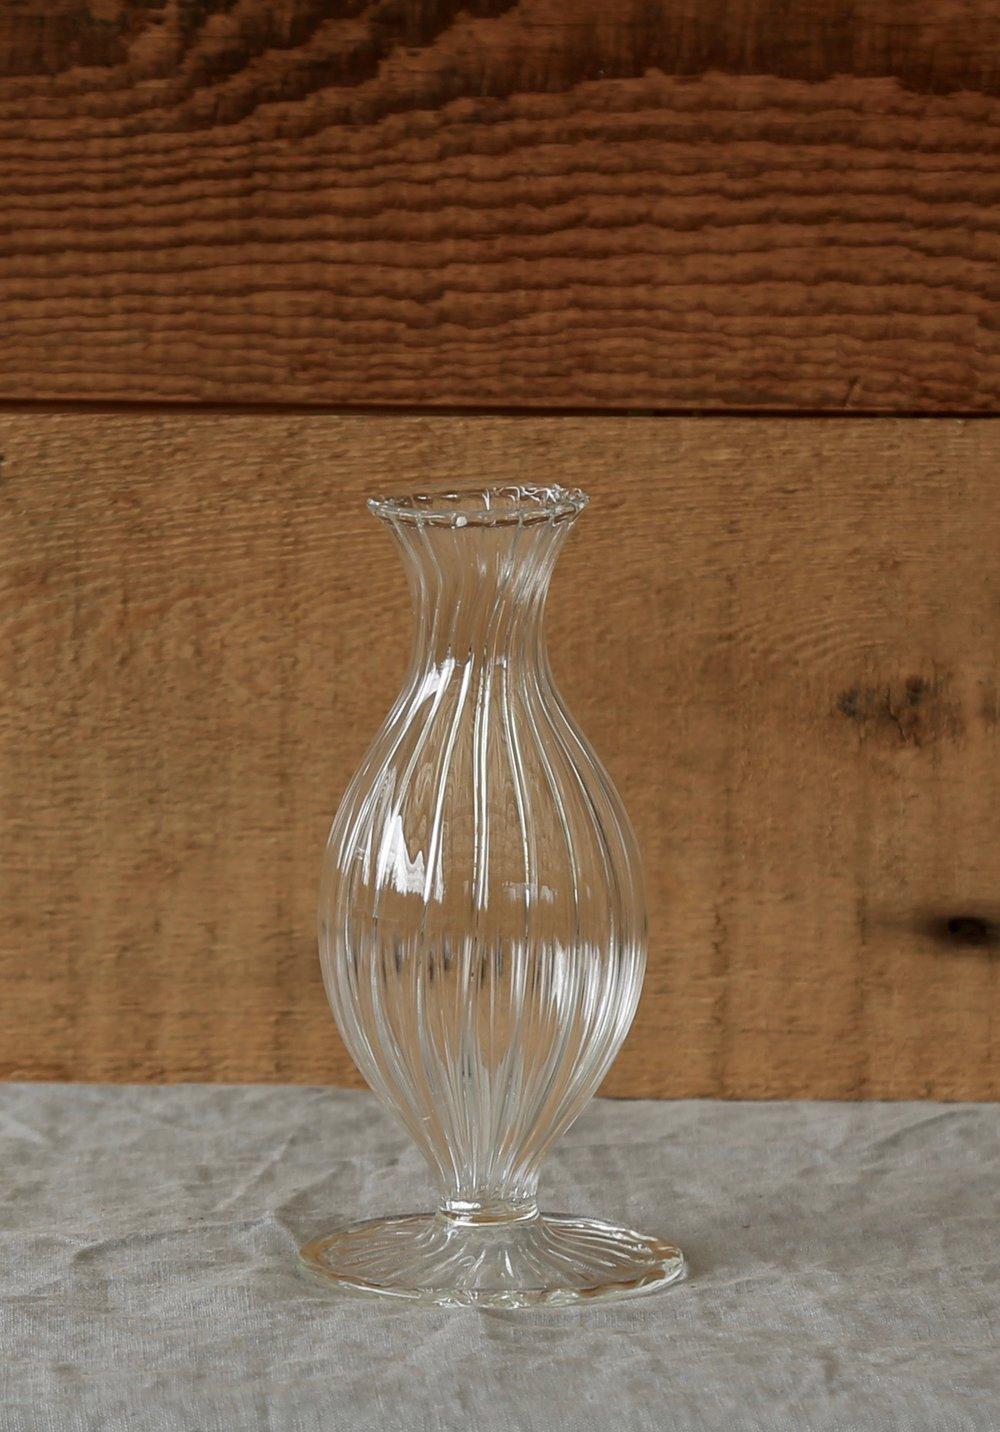 Glass Standard Bud Vase